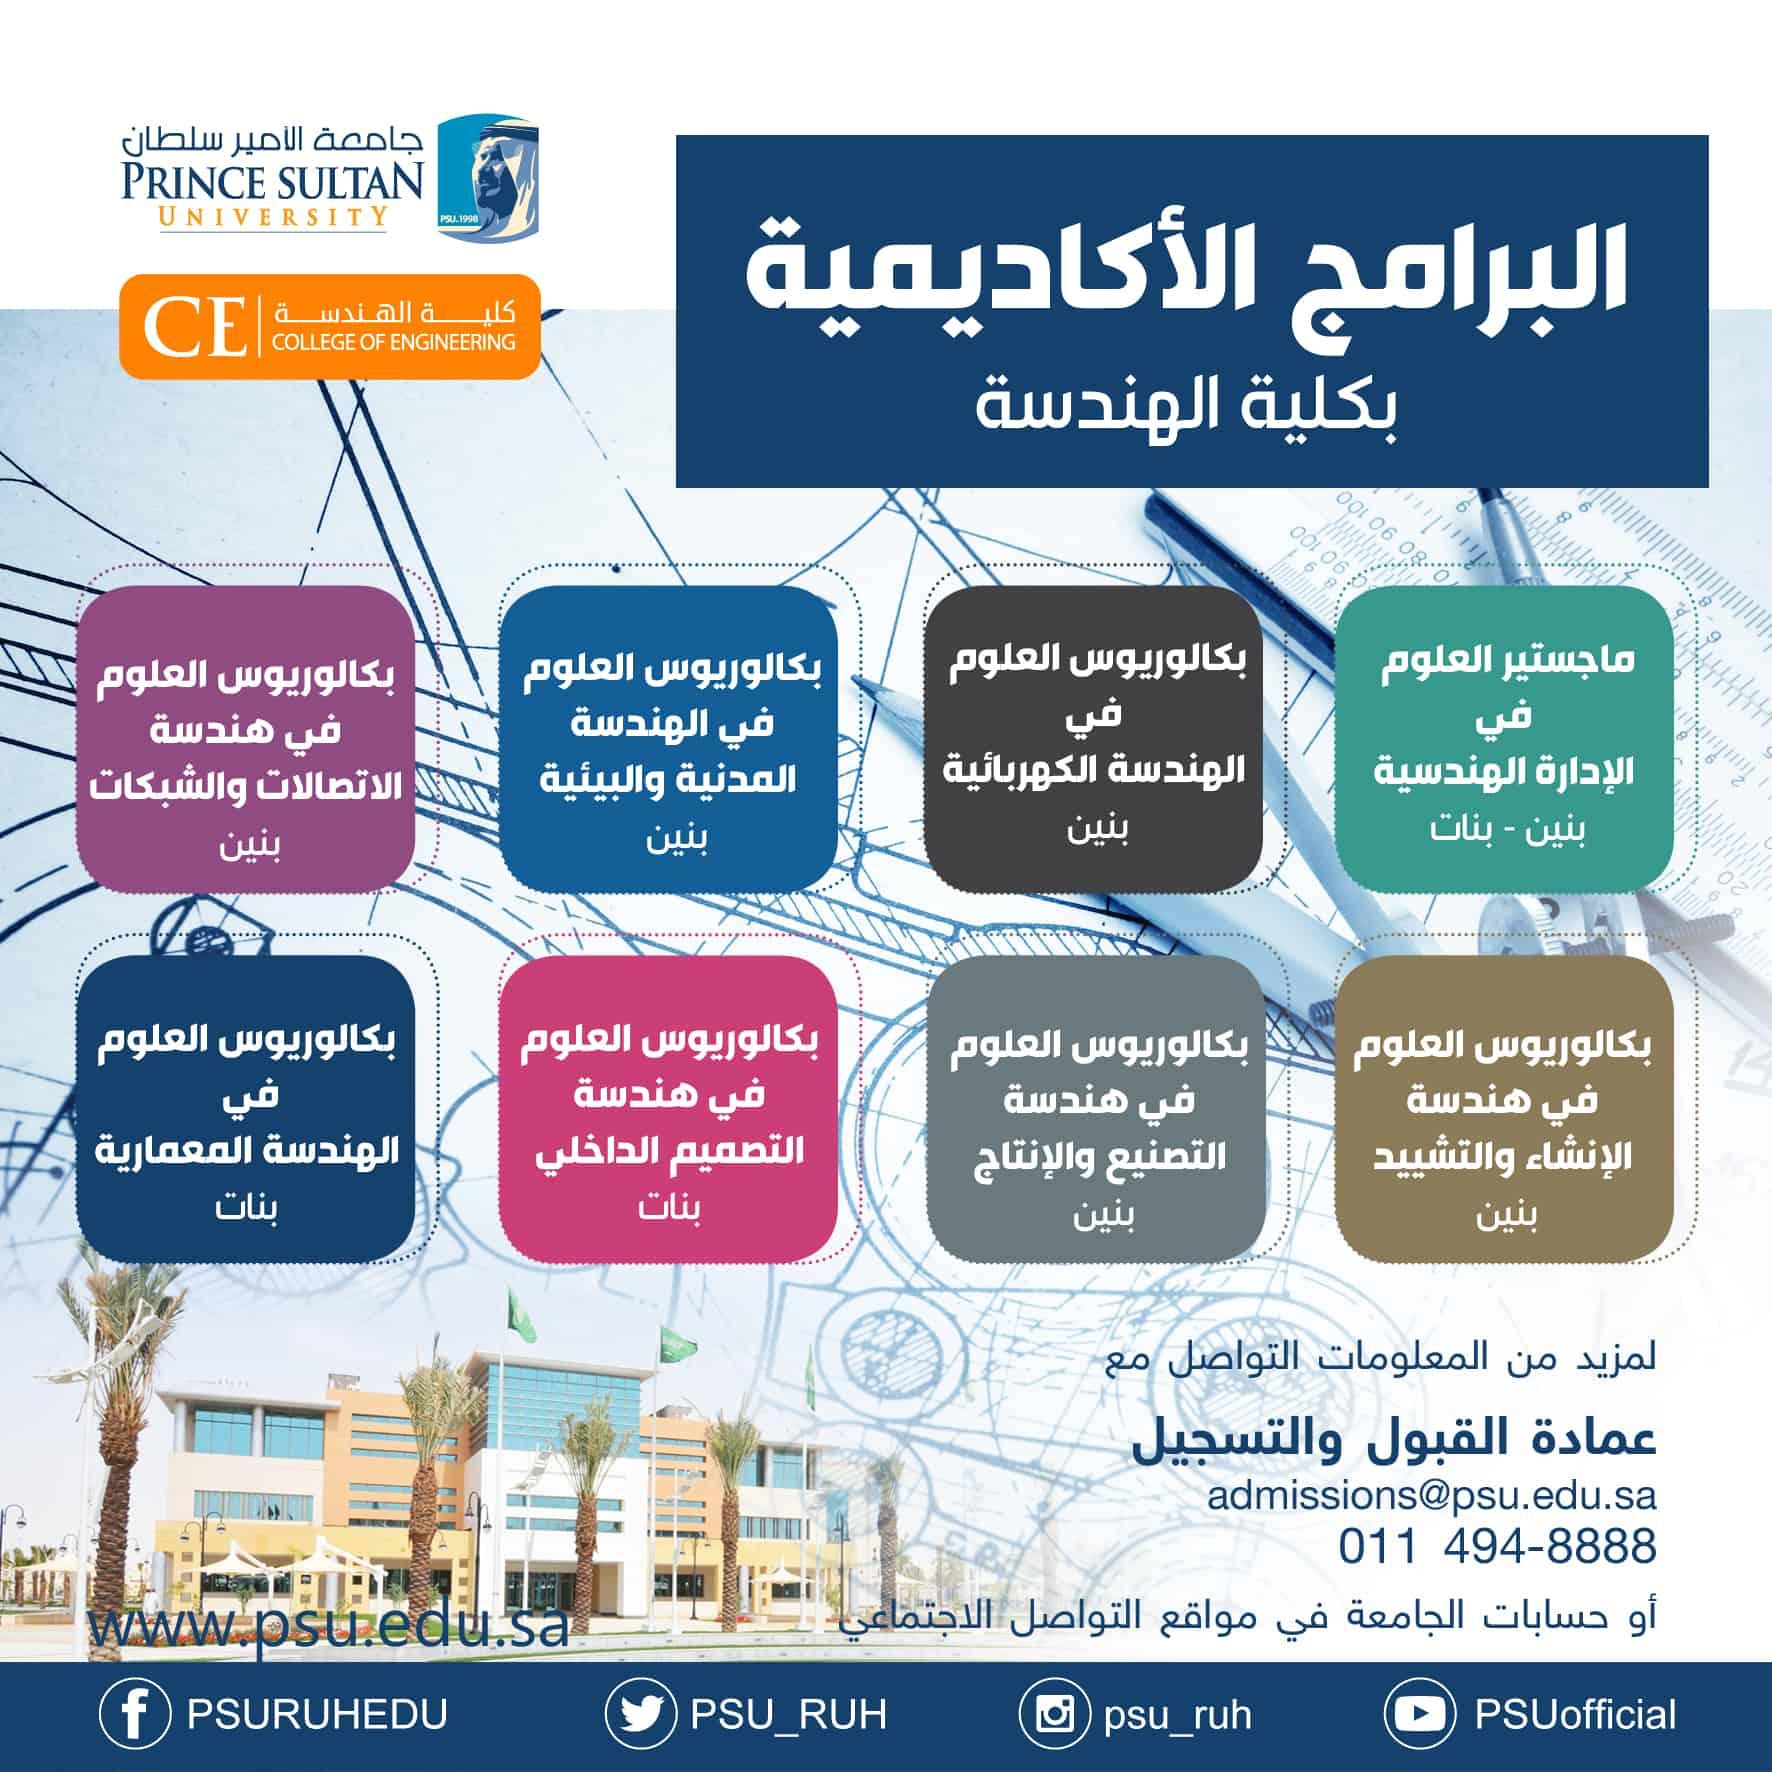 Prince Sultan University Develops Quality Academic Programs